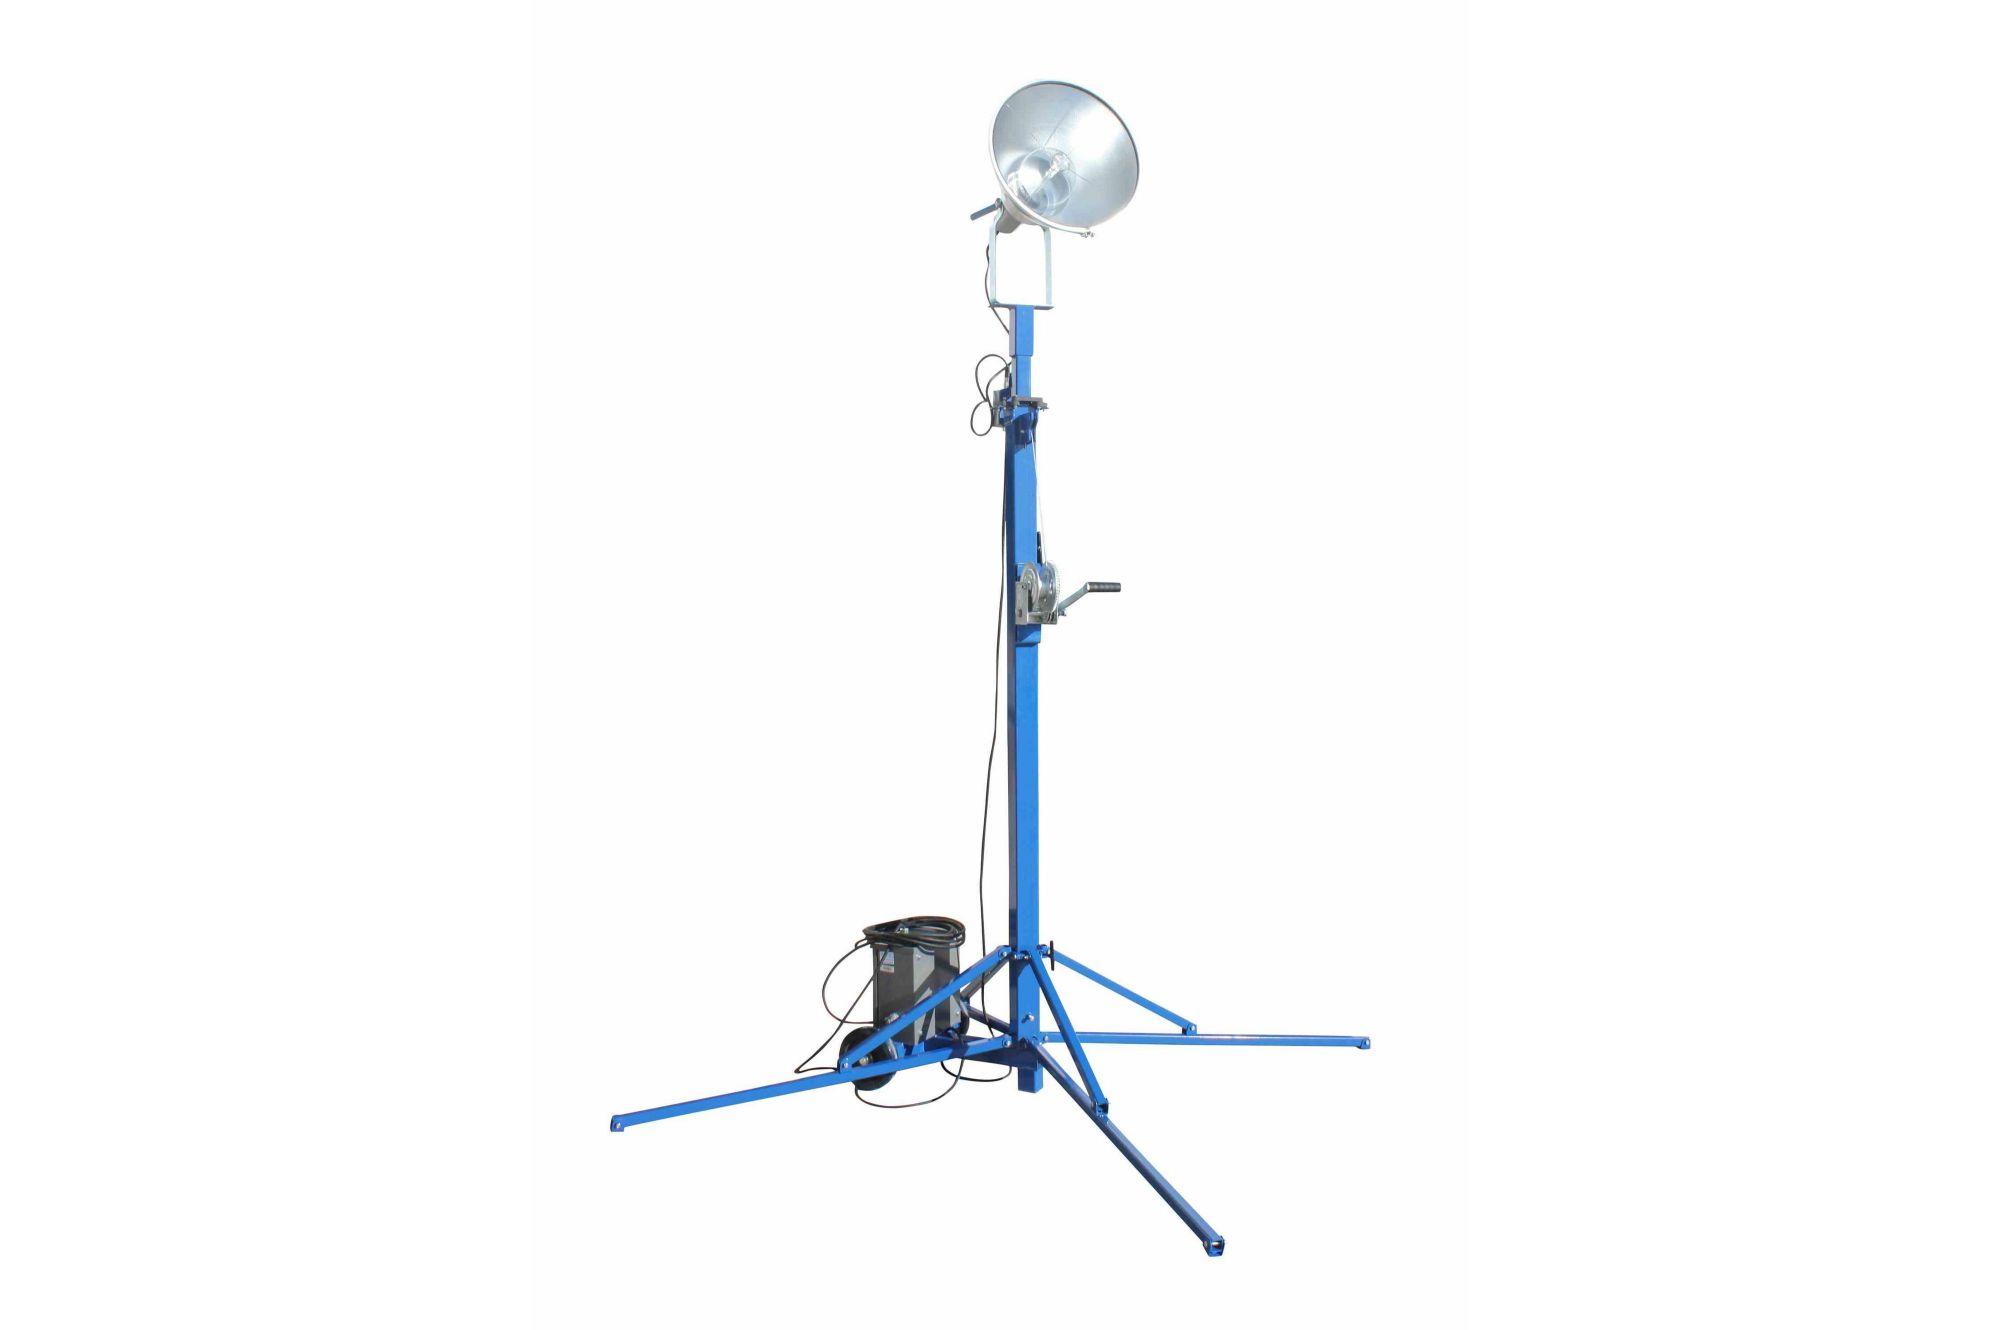 hight resolution of portable light tower 1000 watt metal halide covers 23 000 sf extends to 14 feet